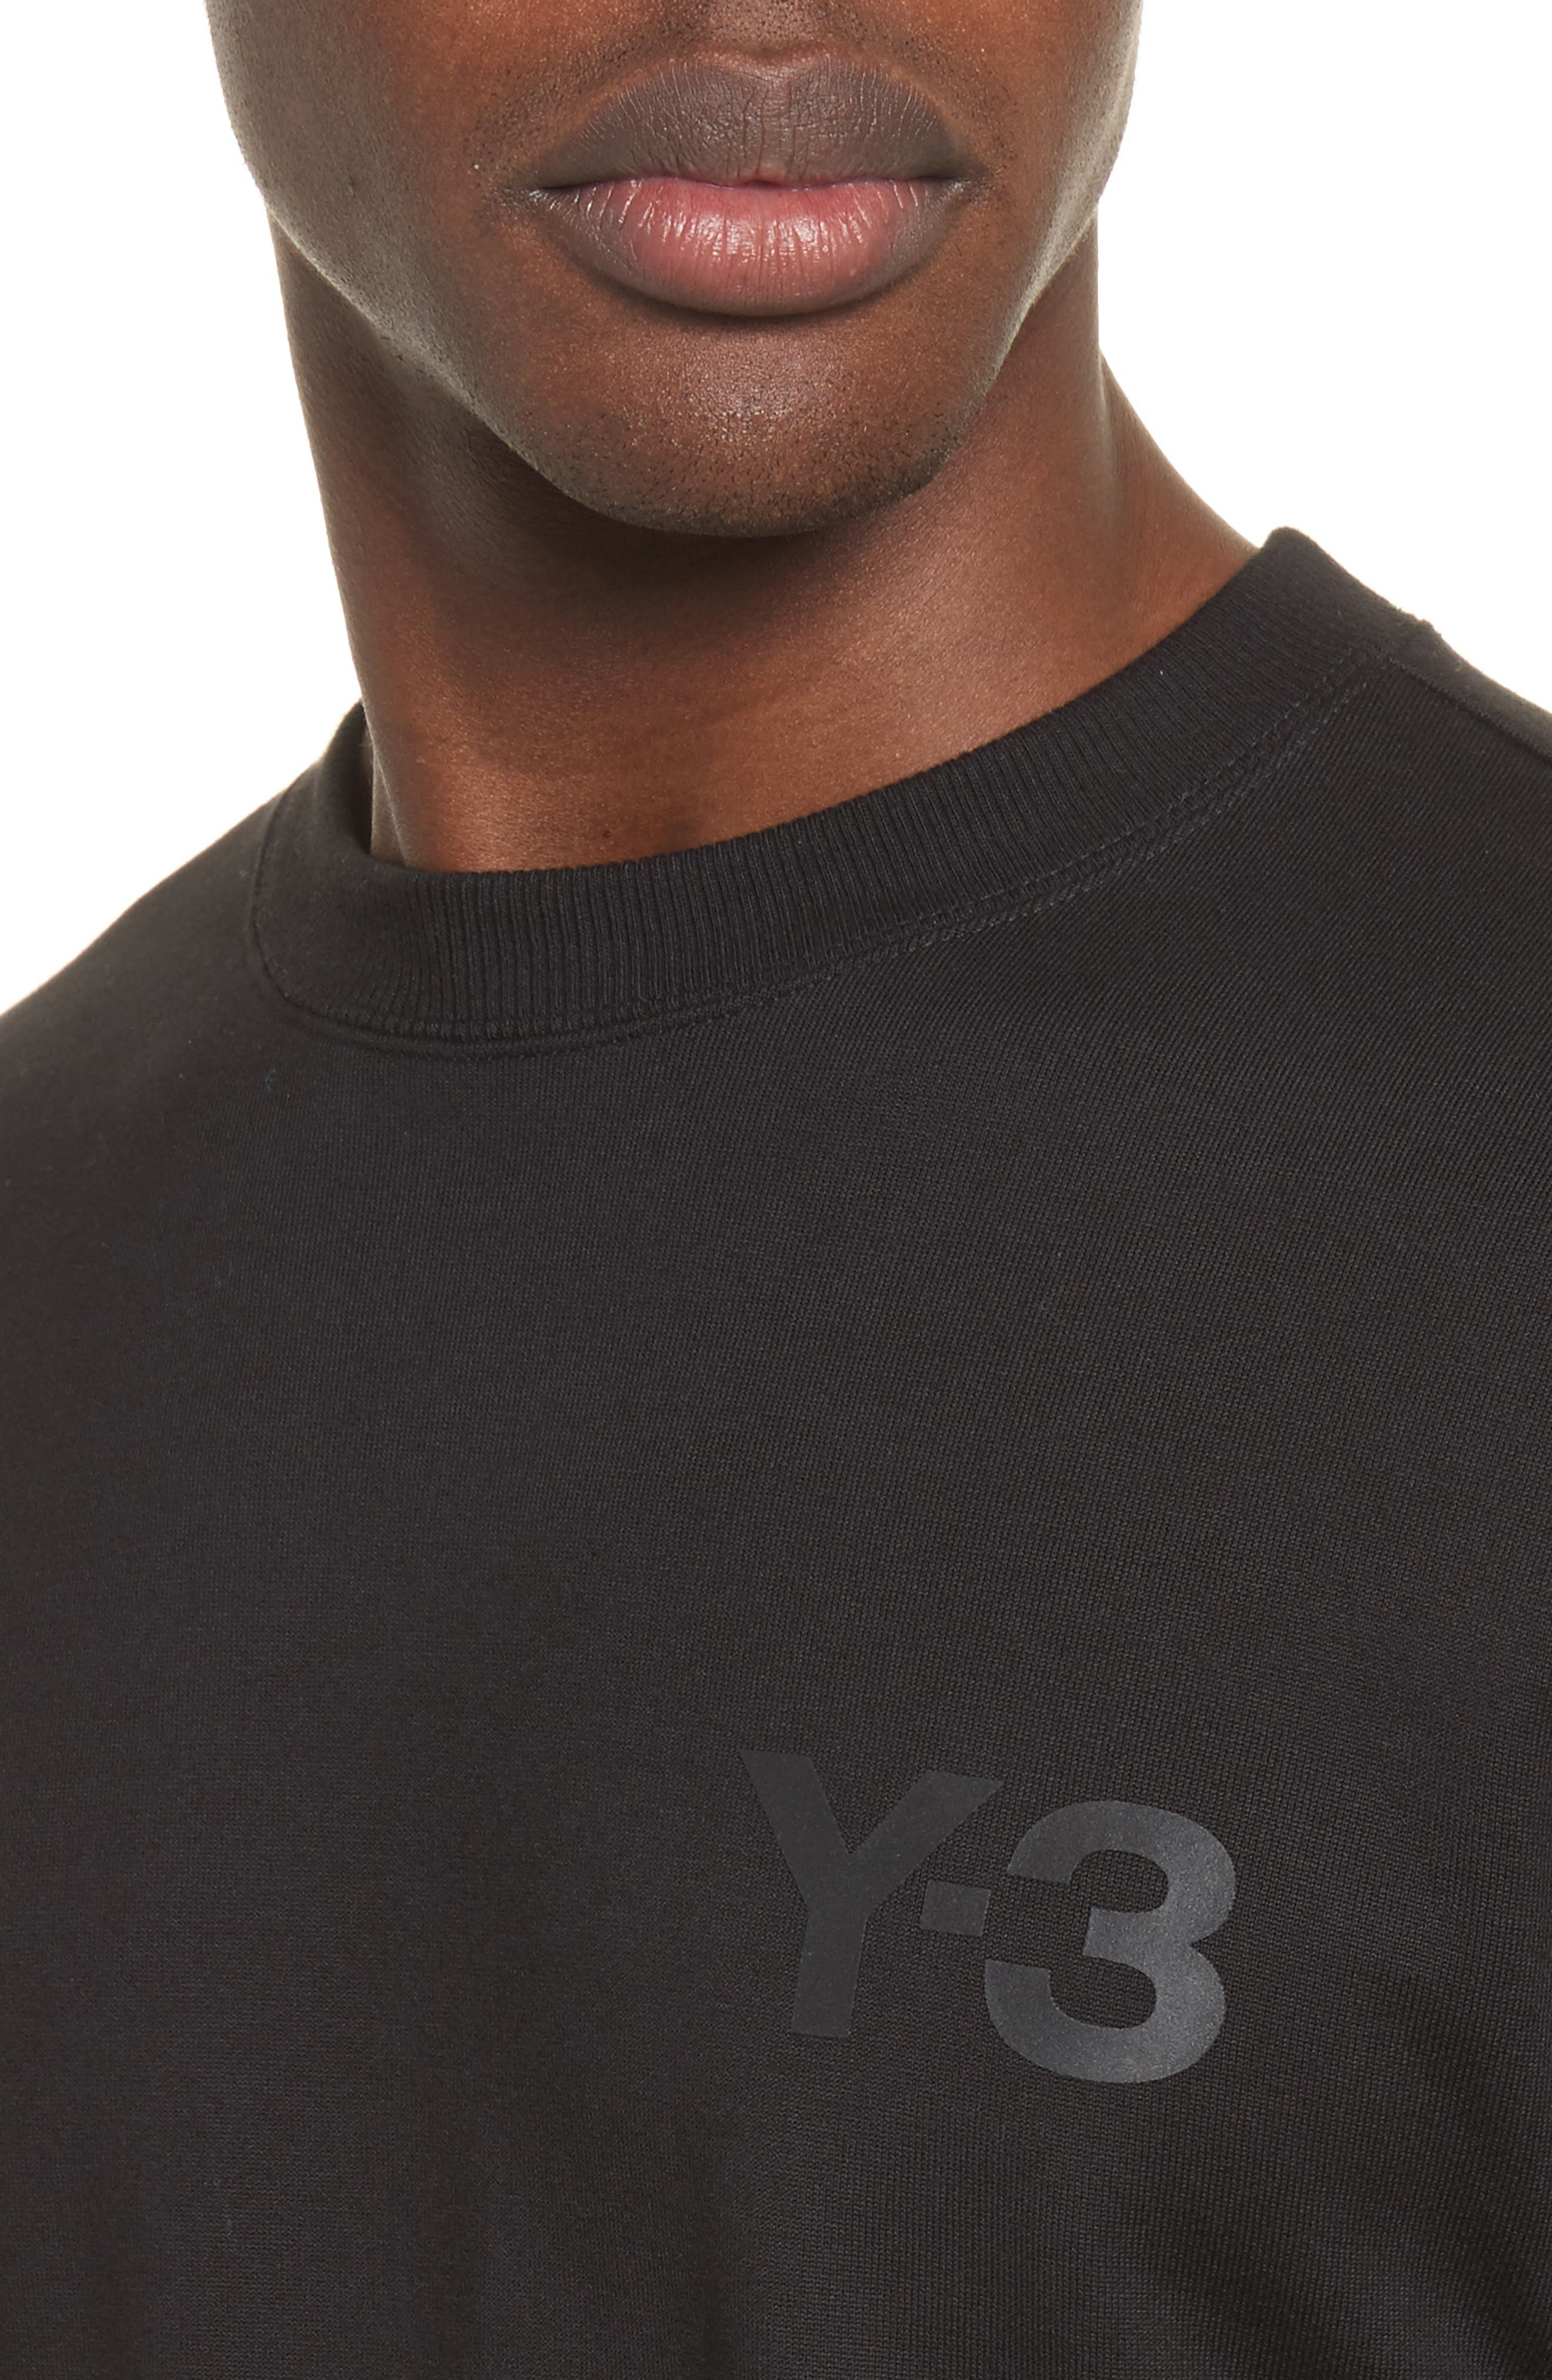 Logo Print Crewneck Sweatshirt,                             Alternate thumbnail 4, color,                             Black